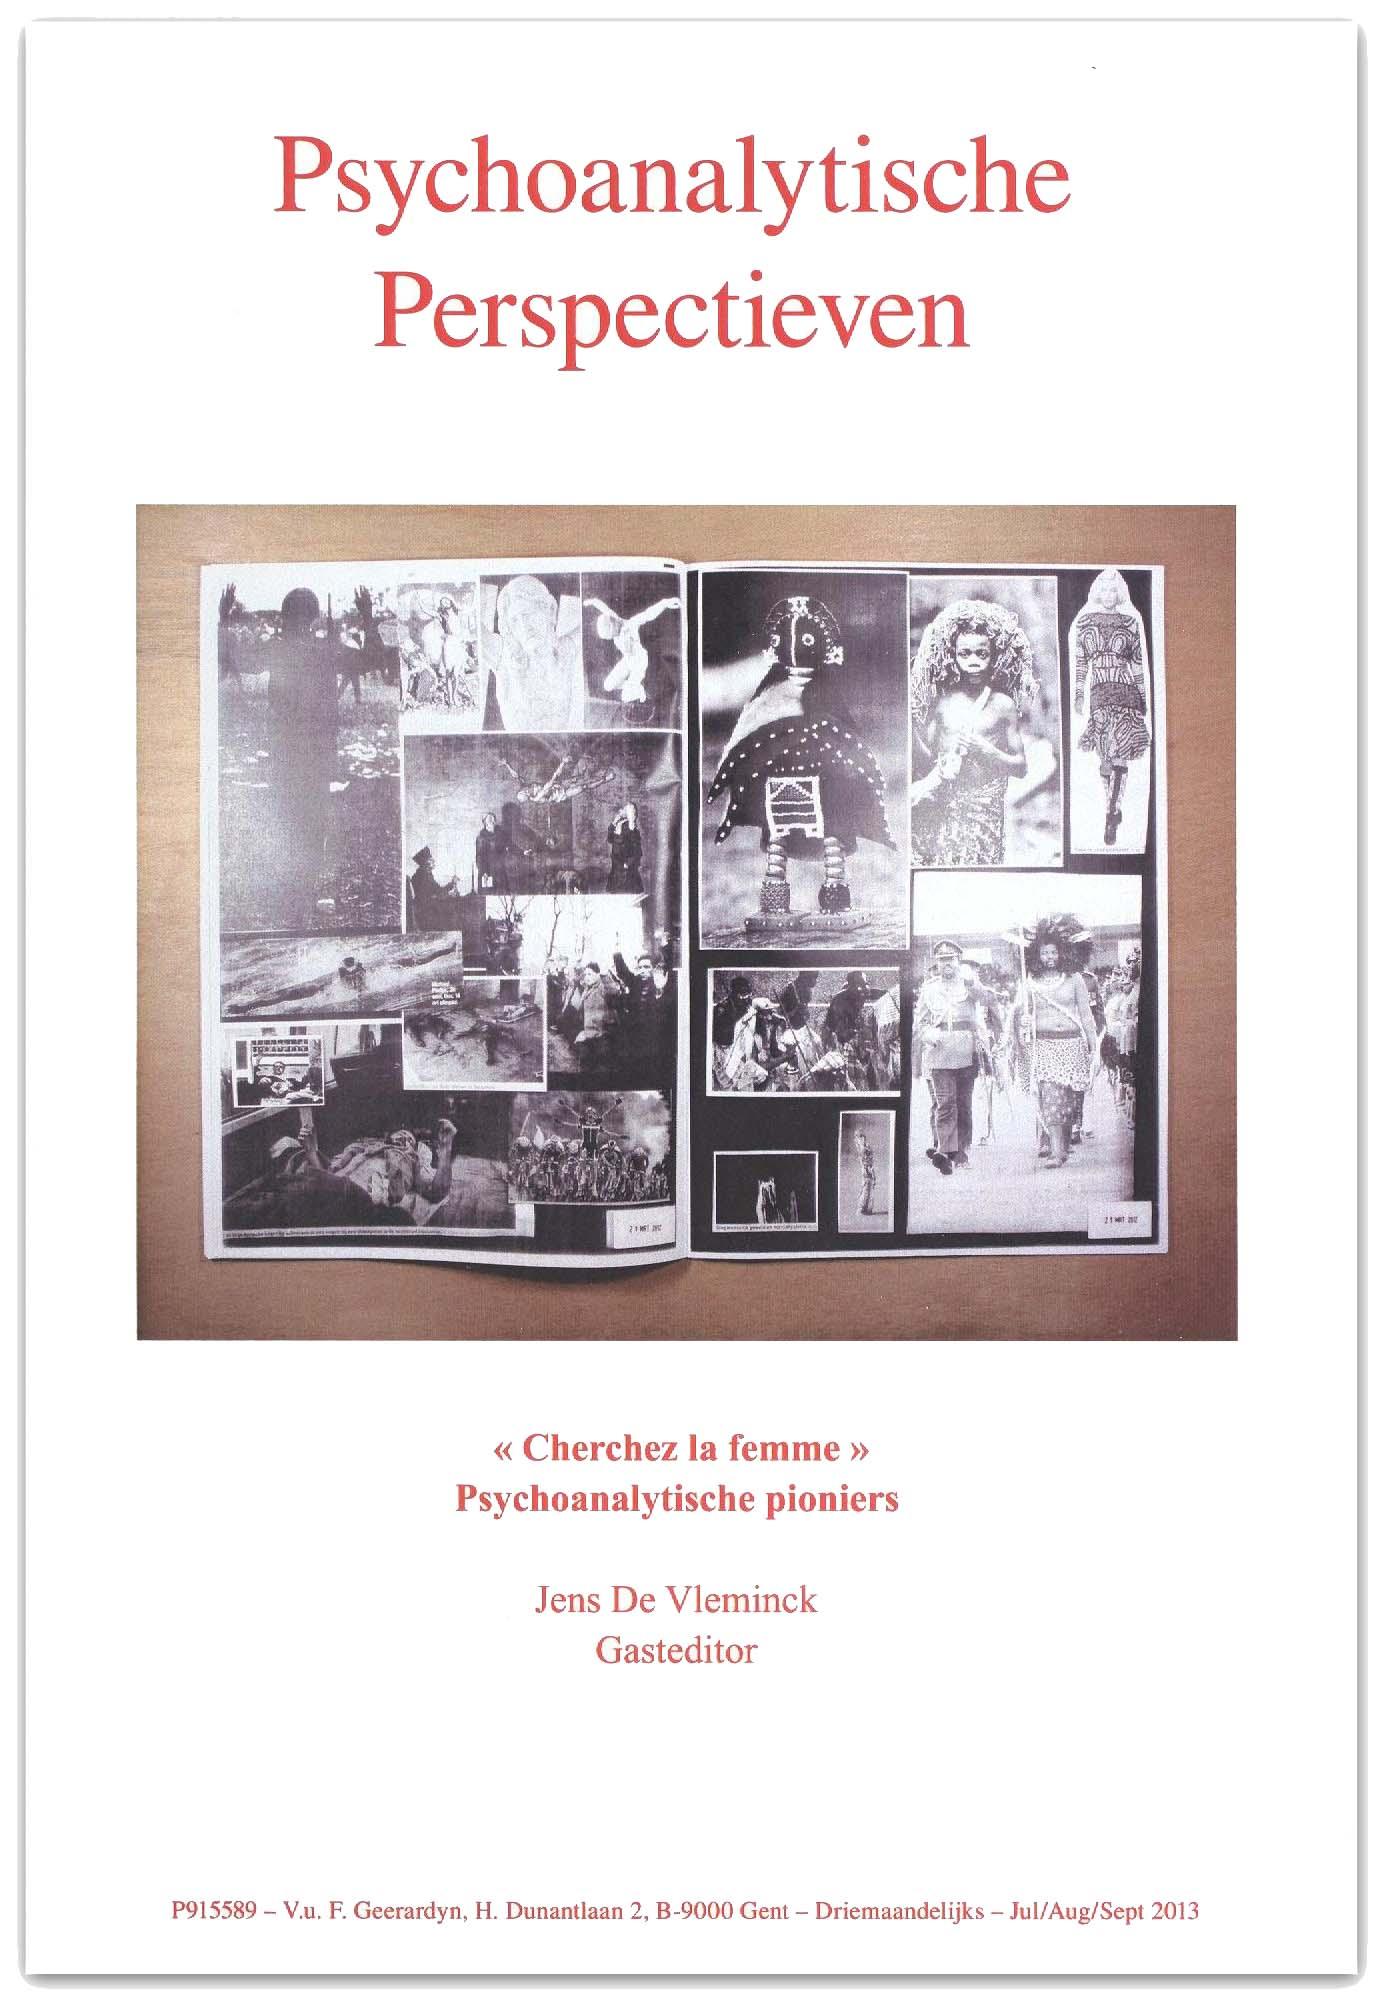 Psychoanalytische perspectieven for Extra mural meaning